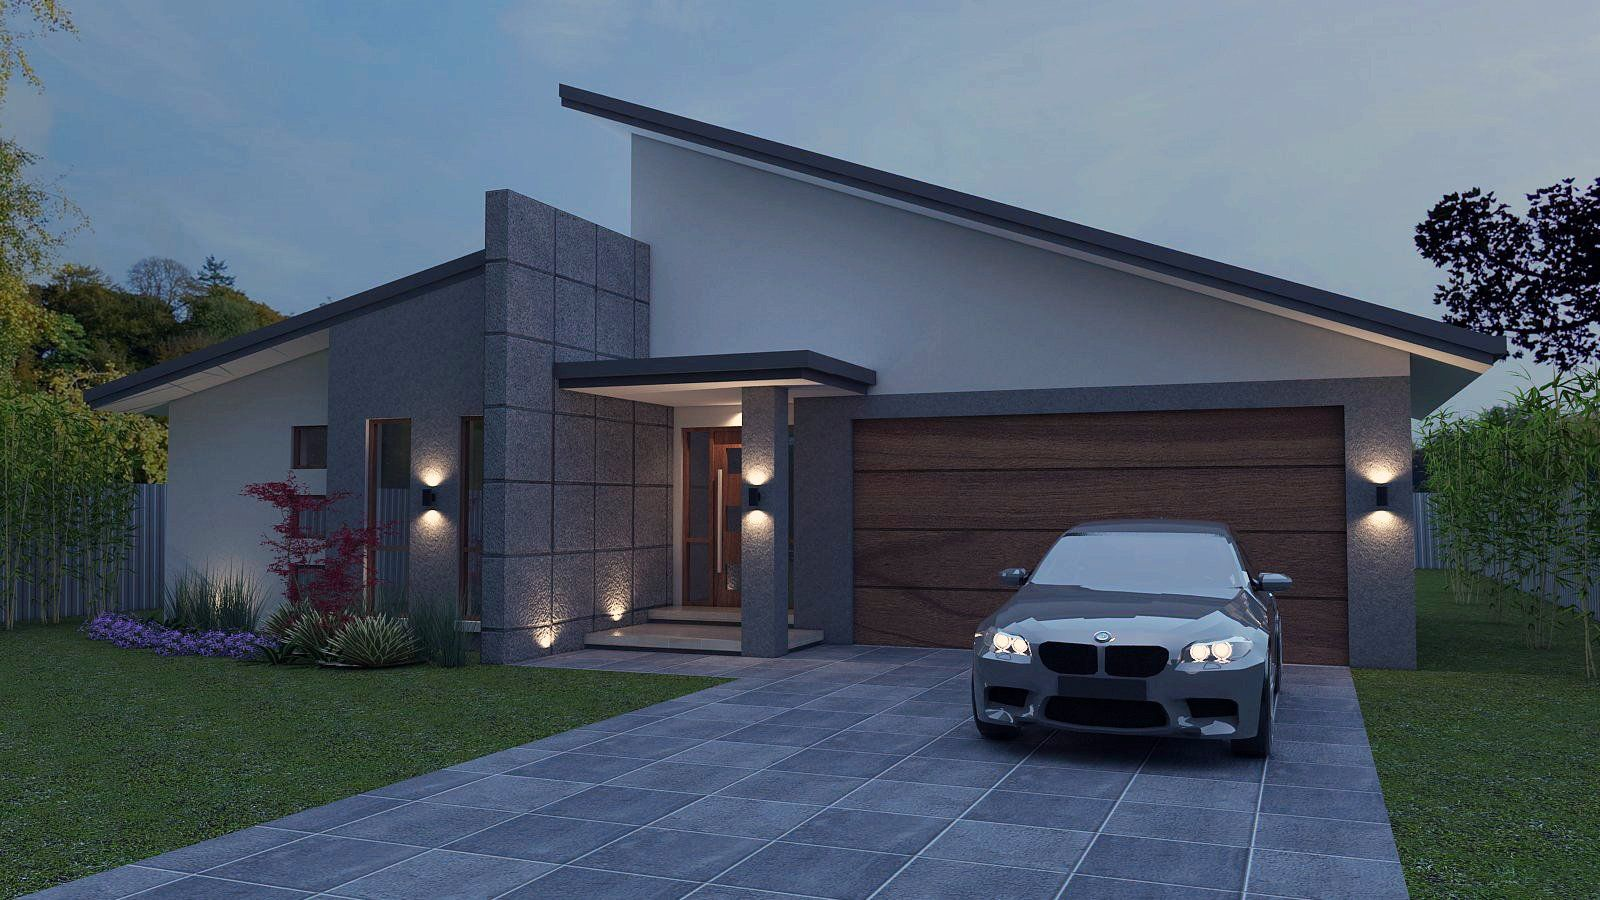 Green- 4 Bed Garage 233.0 M2 Skillion Roof